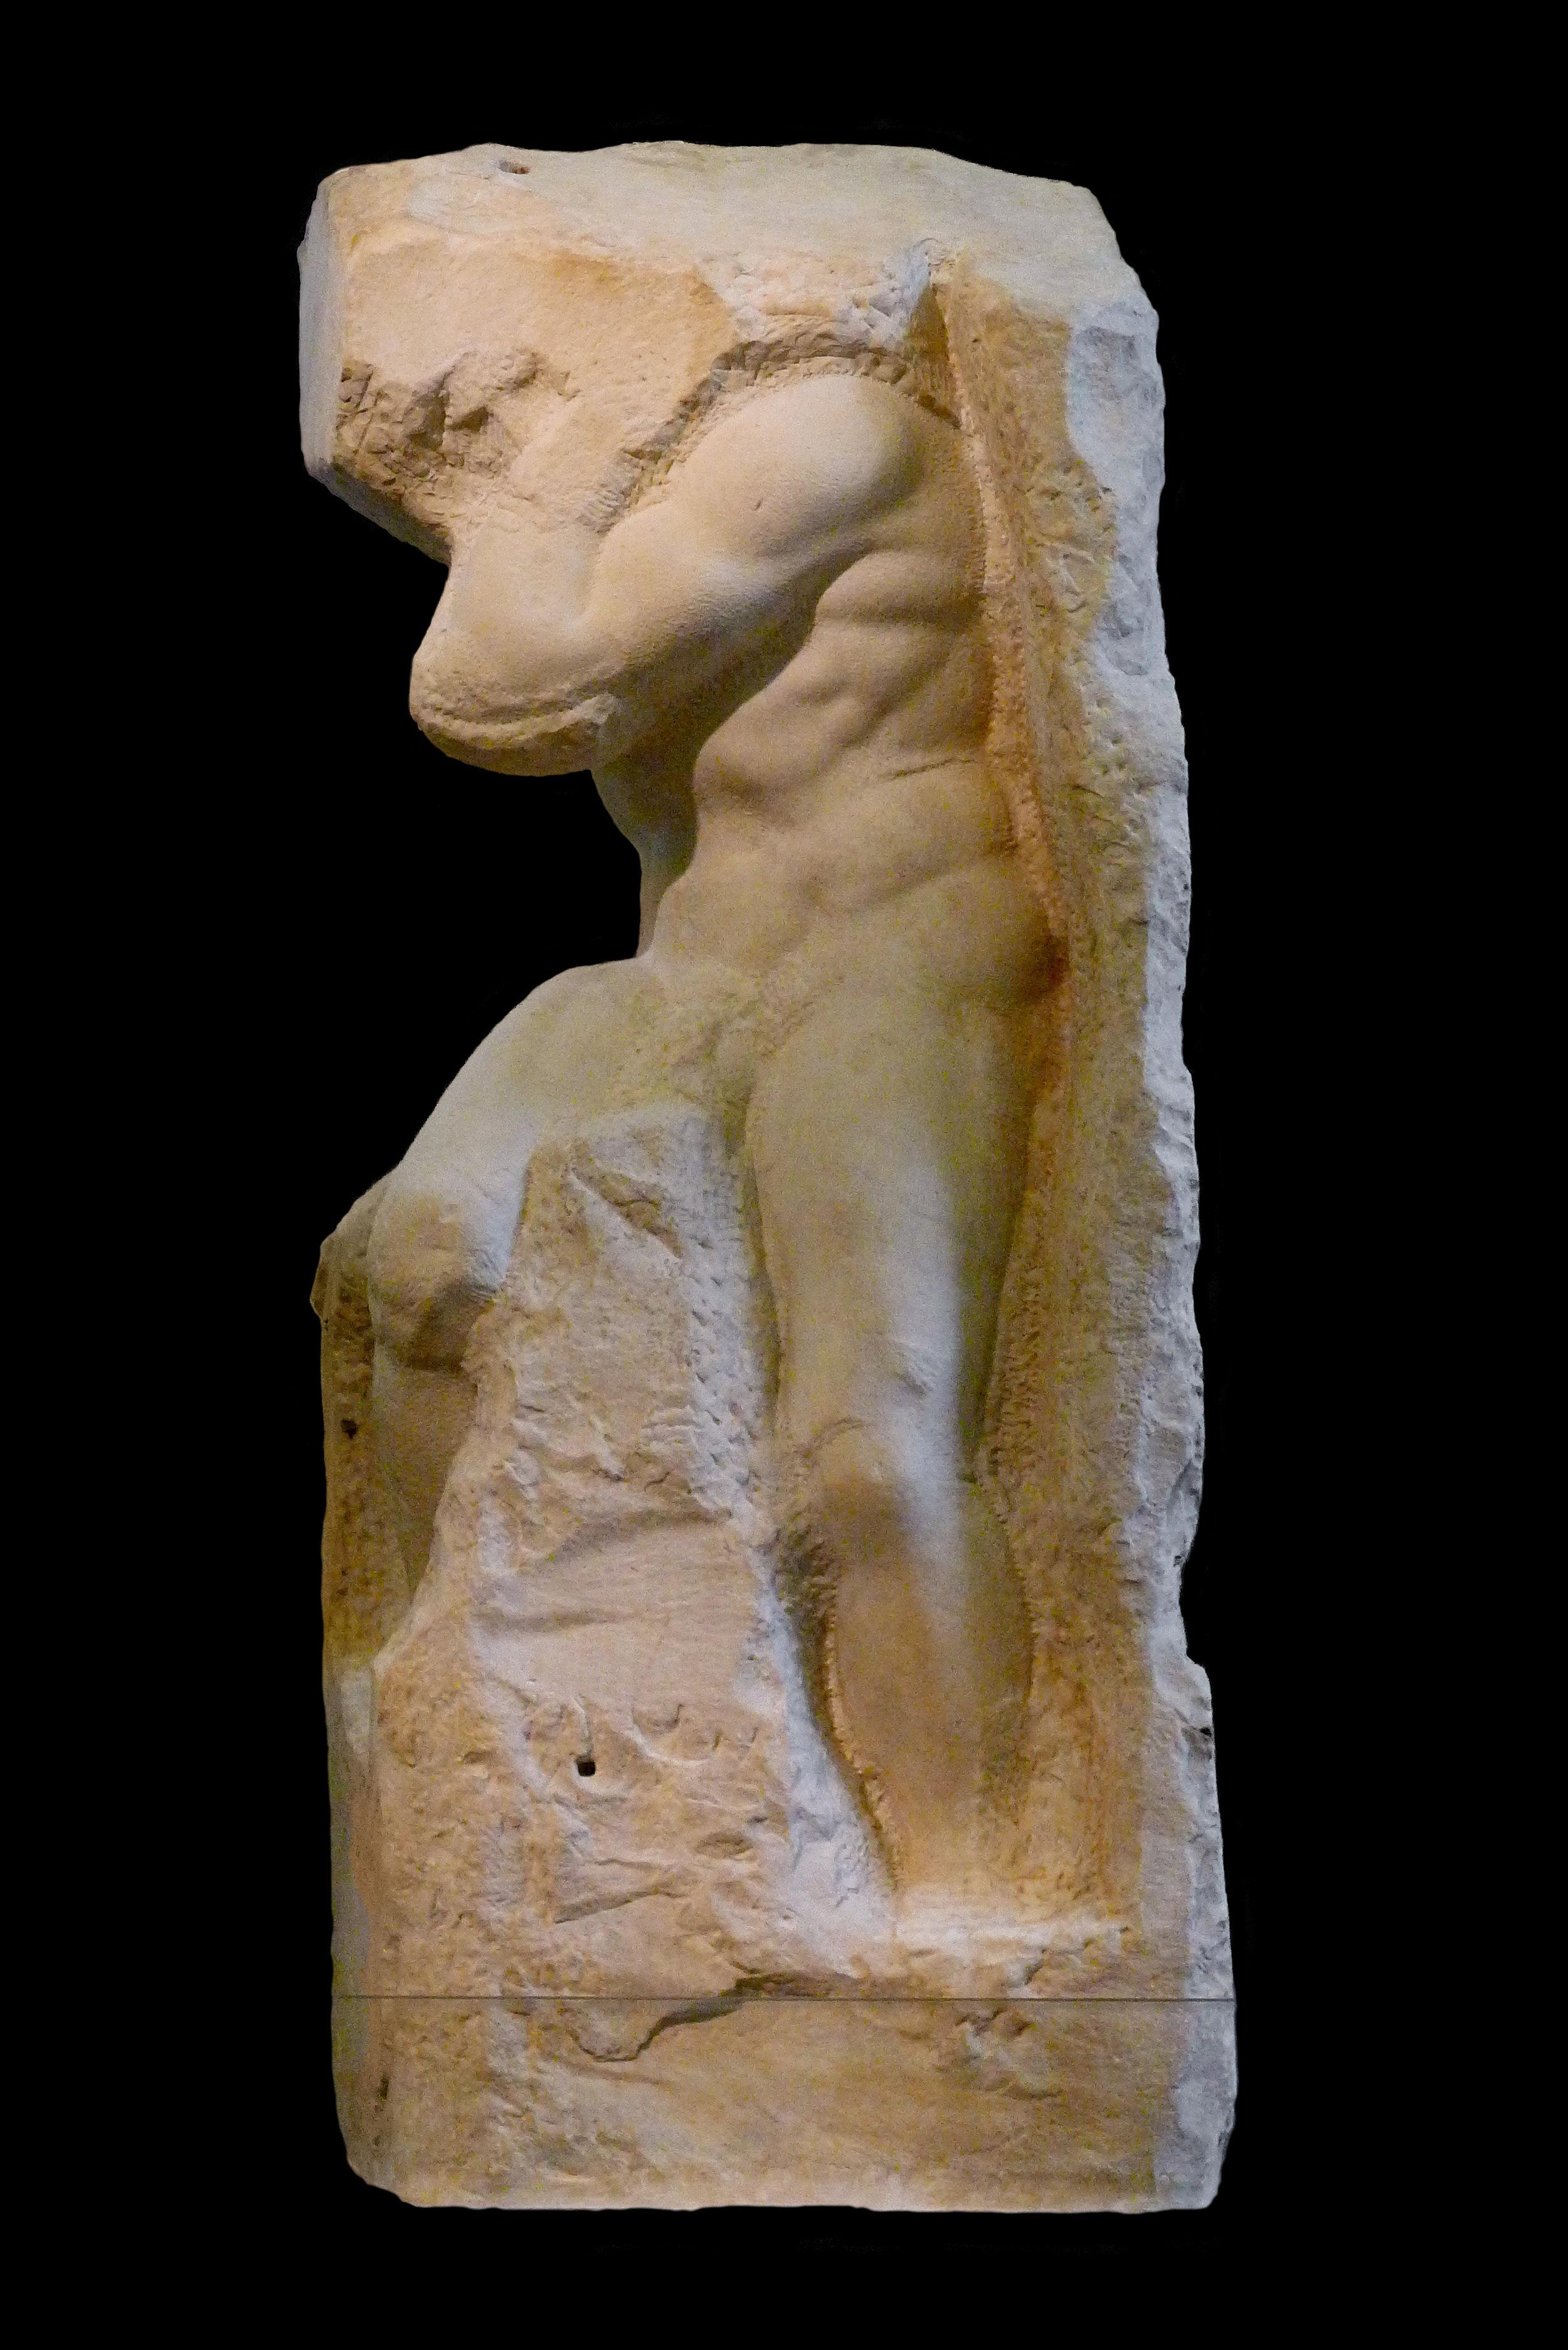 'Atlas_Slave'_by_Michelangelo_-_JBU_02.jpg